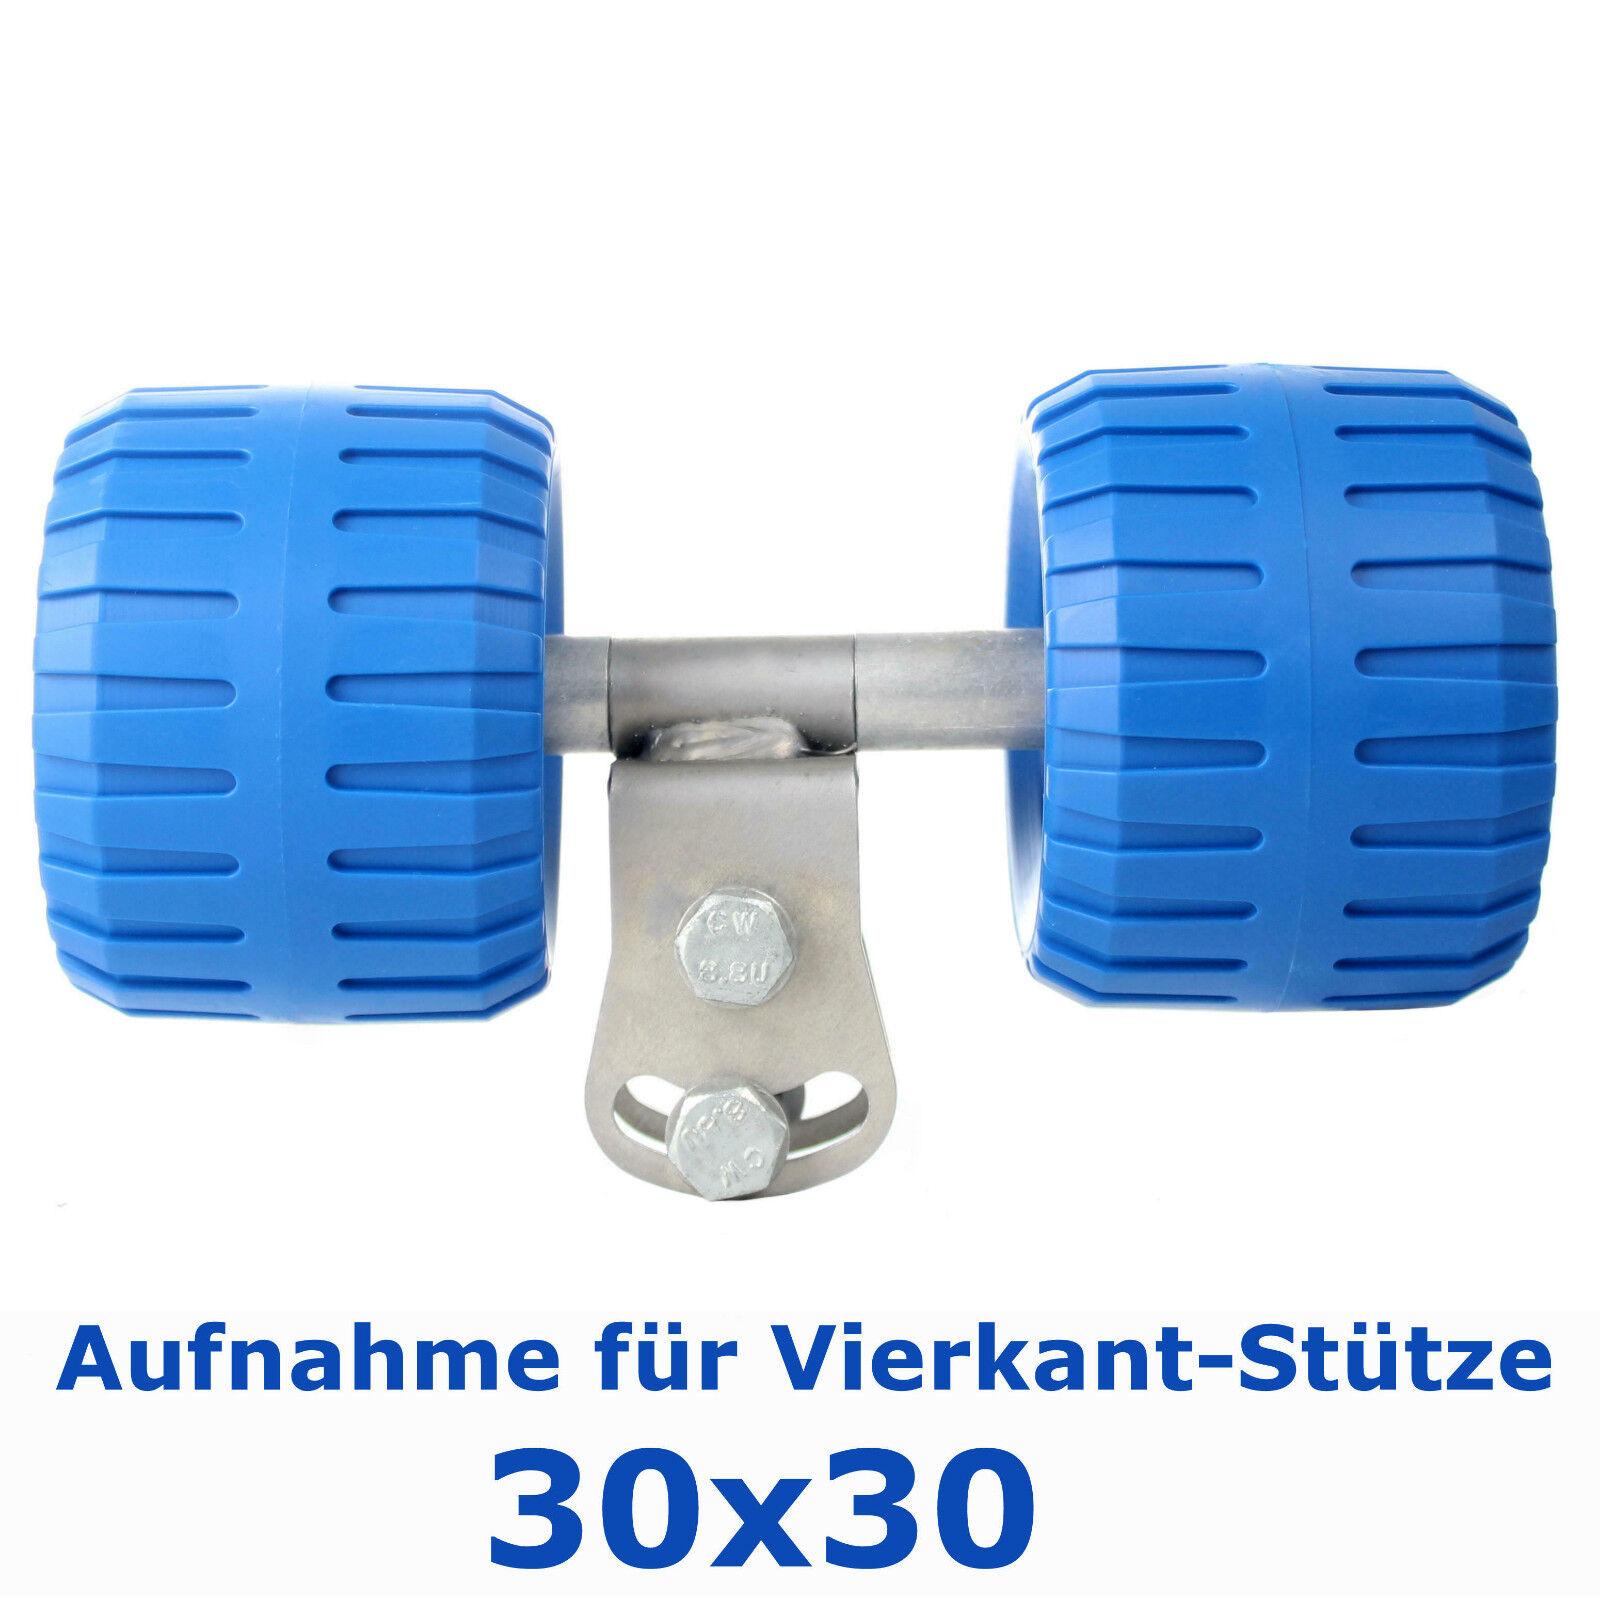 ⚓ Seitenrolle mit Adapter ➔ Wobblerolle blau, blau, blau, Ø100 - spurfrei  | Sliphilfe 13827e